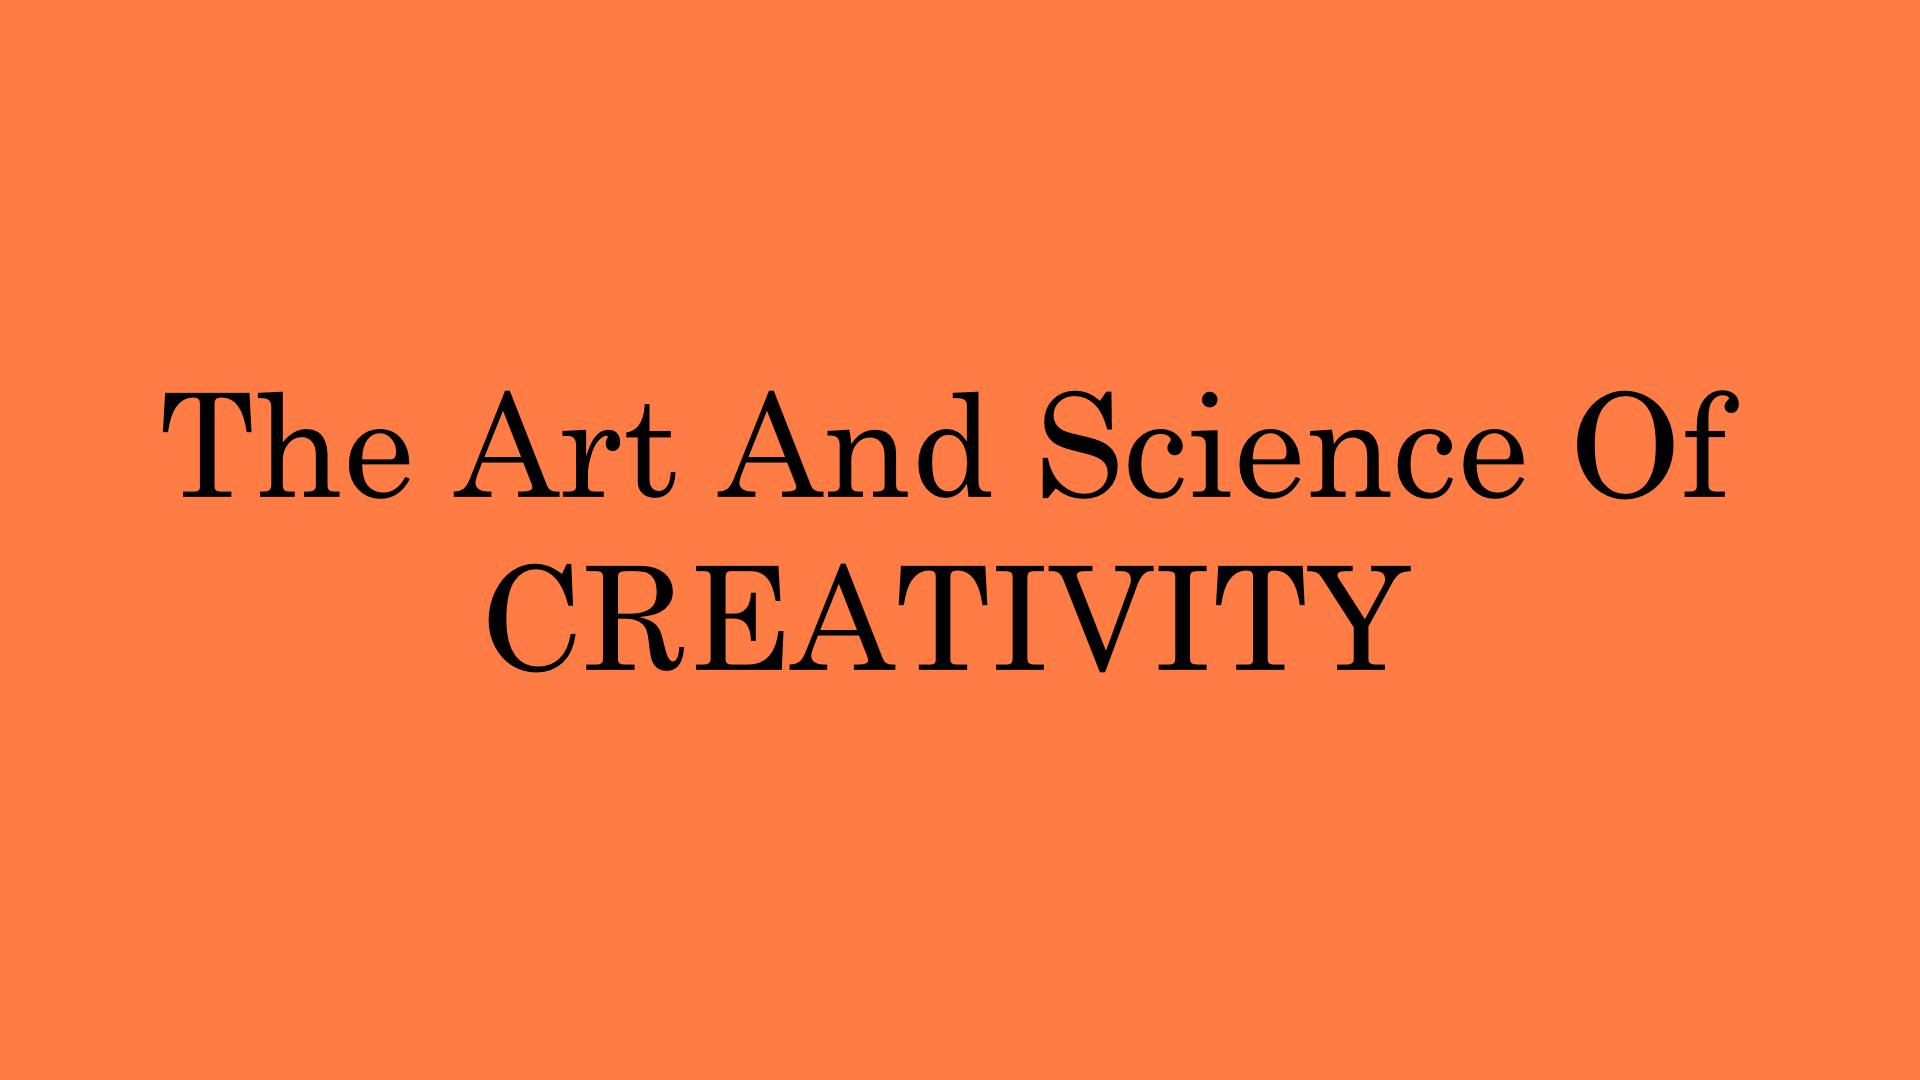 The Art & Science Of Creativity